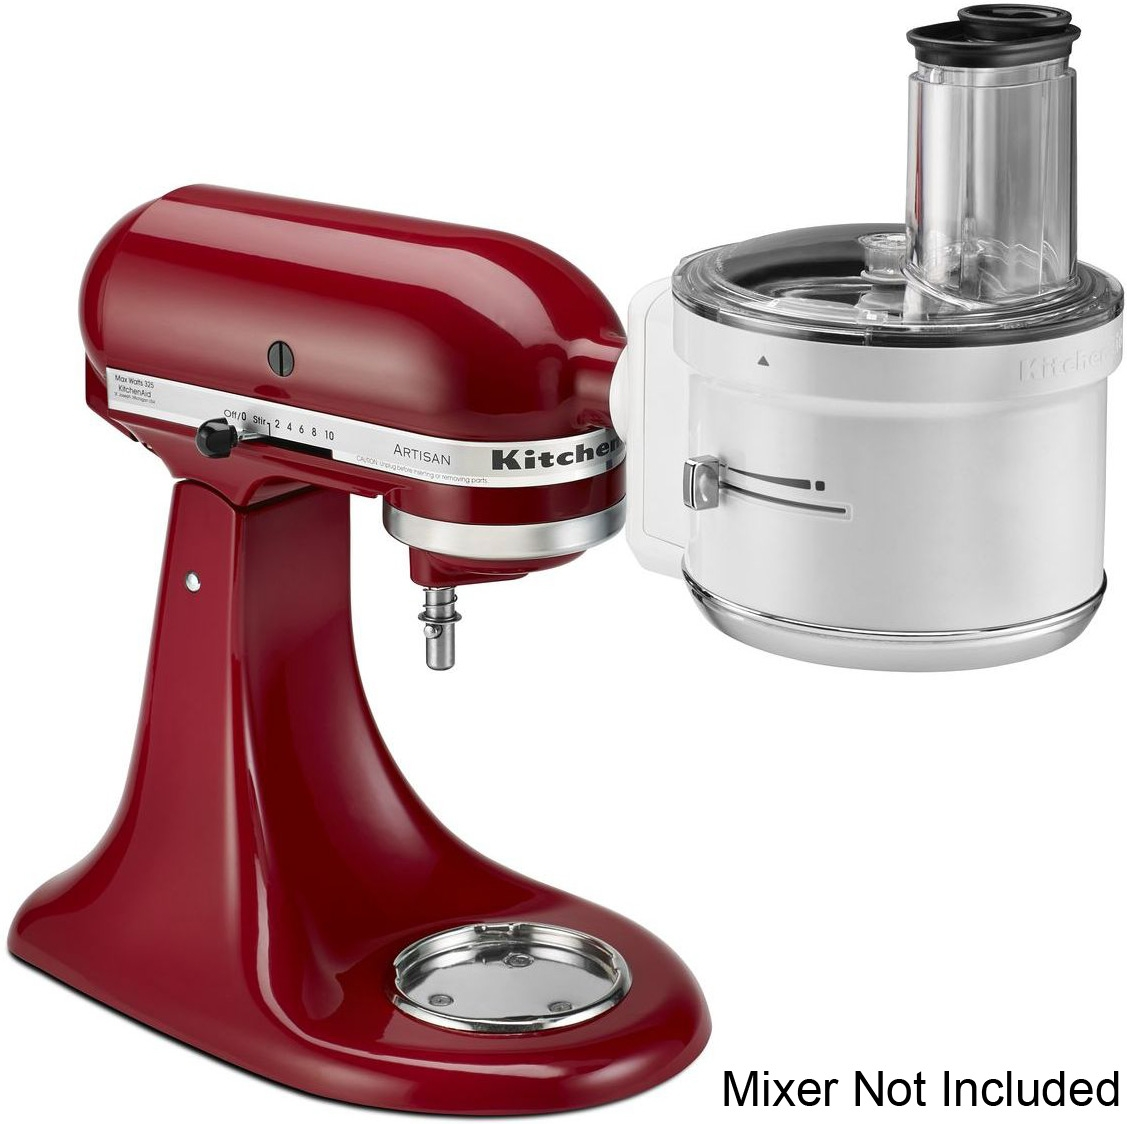 KitchenAid Food Processor Attachment For KitchenAid Stand Mixers